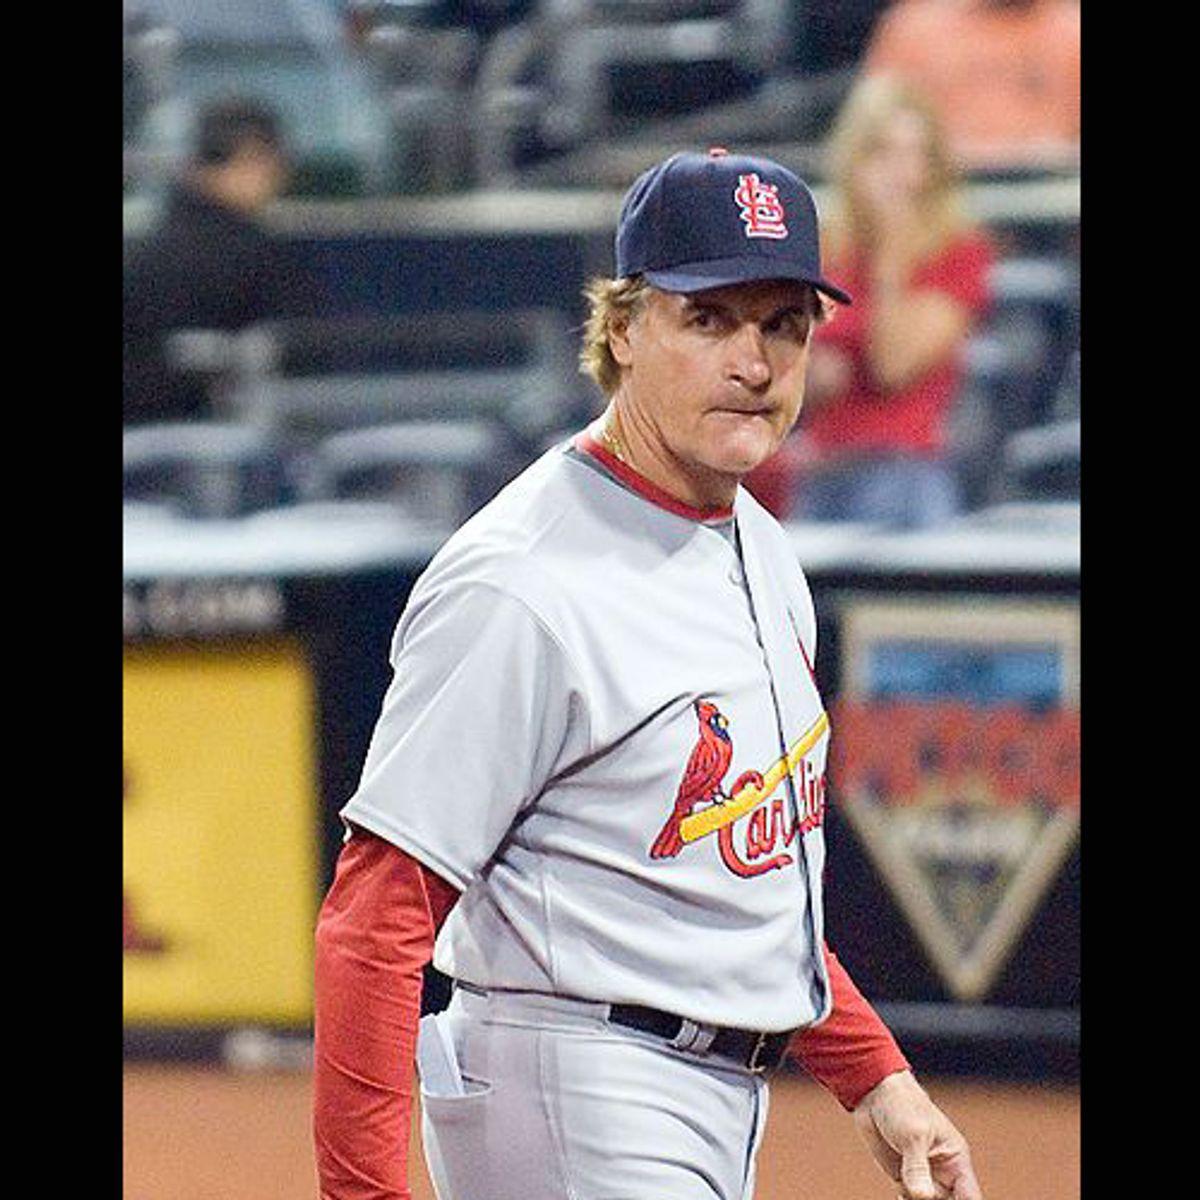 Baseball S Animal Crazed Tea Party Liking Manager Salon Com